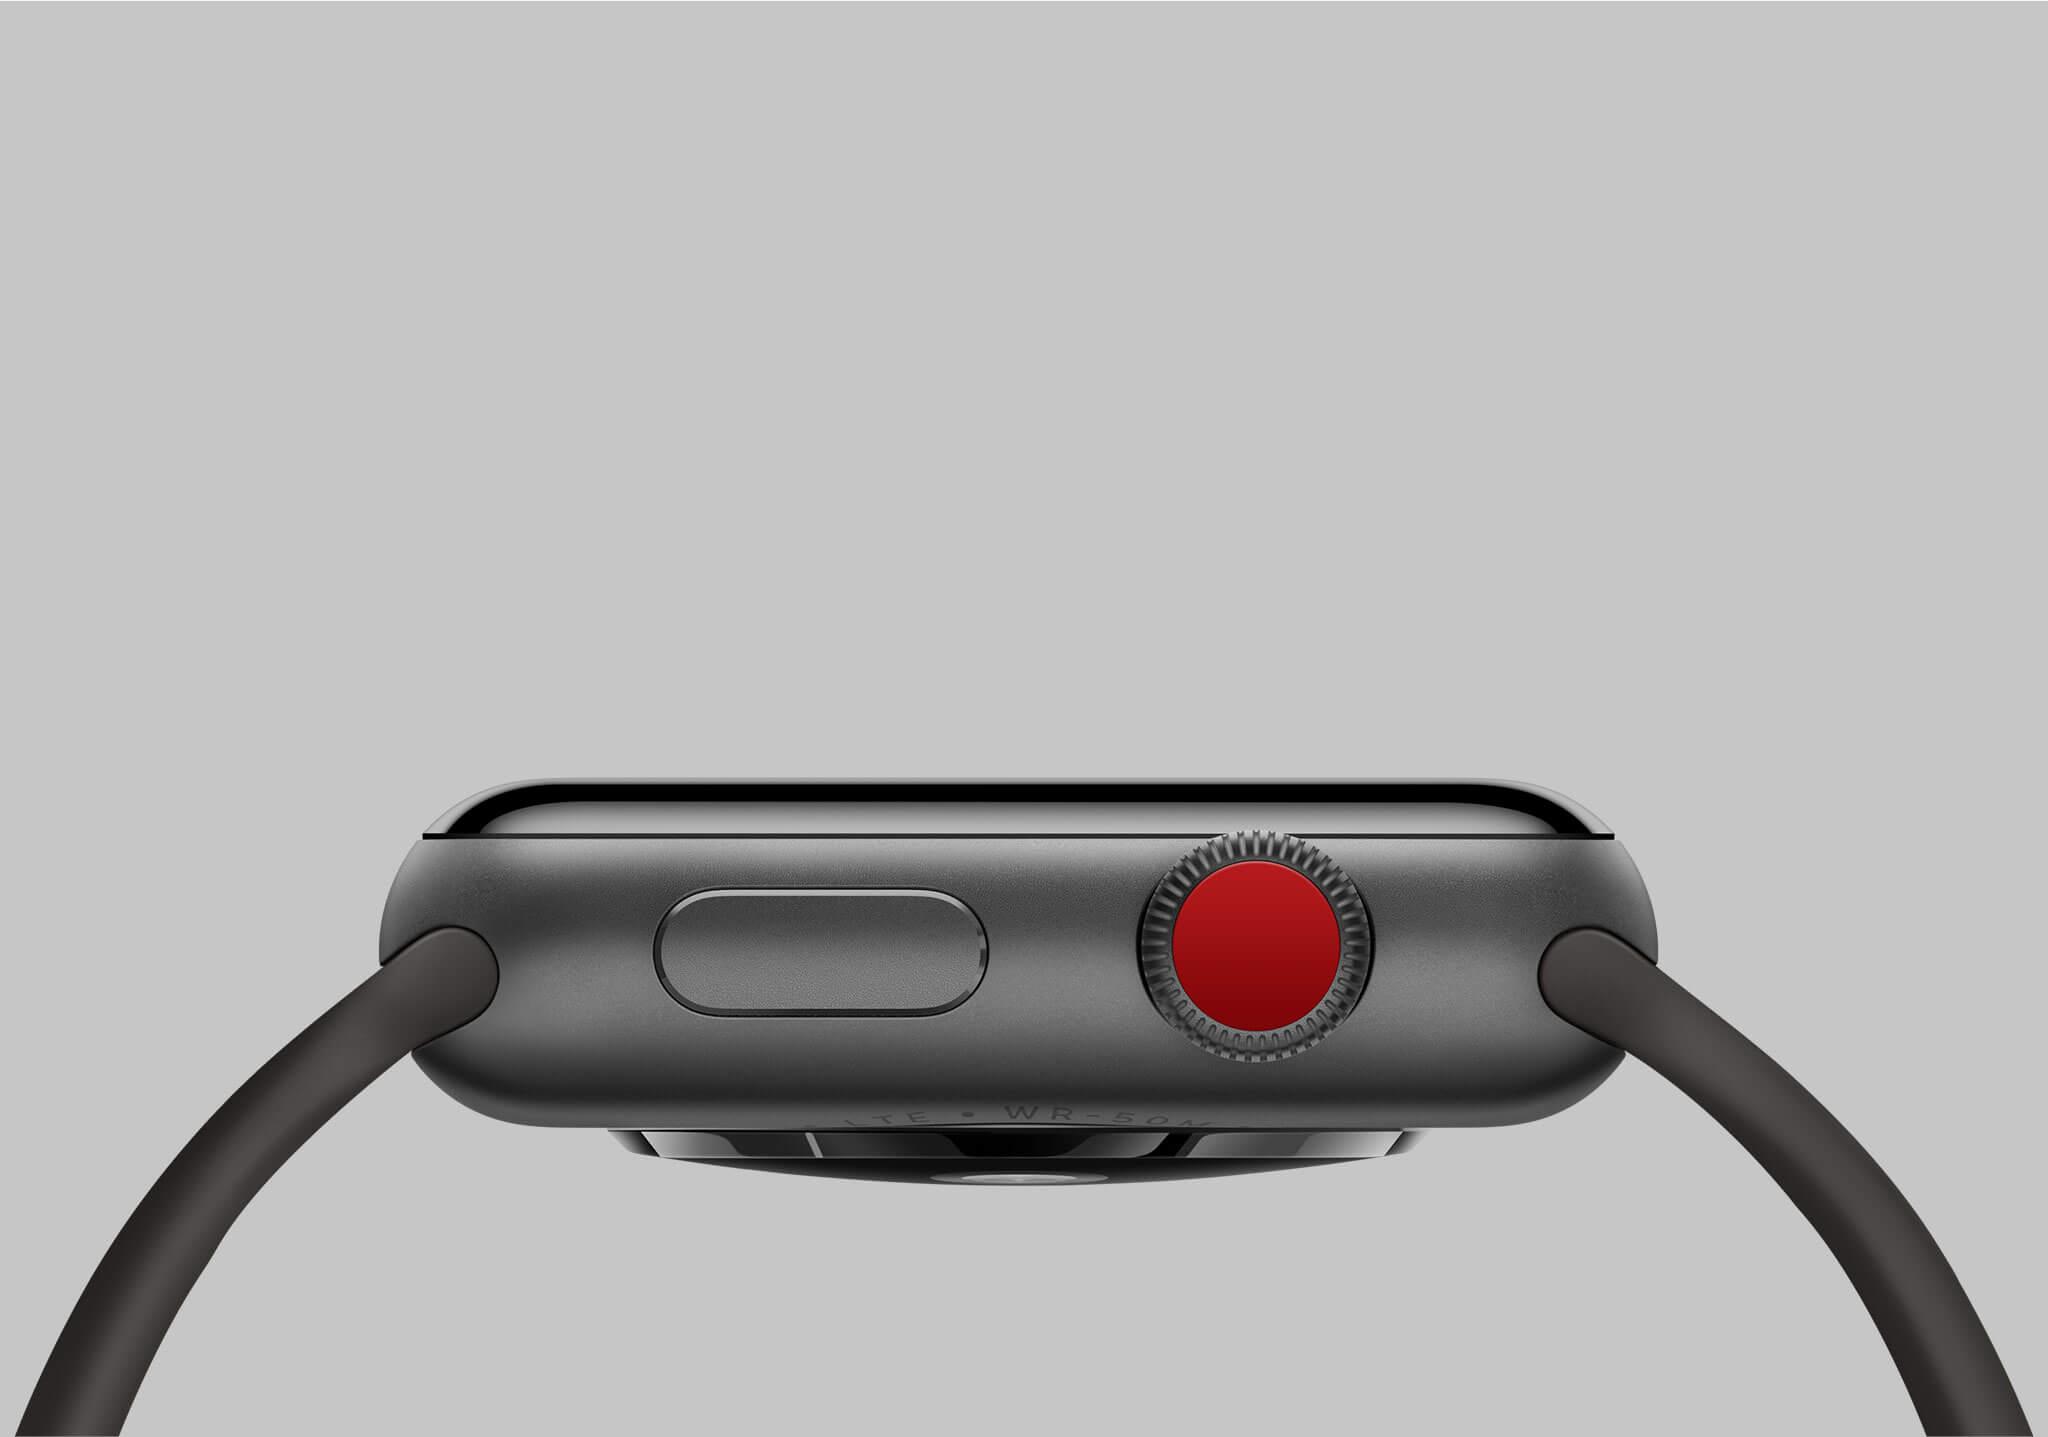 Apple Watch 3 Cellular